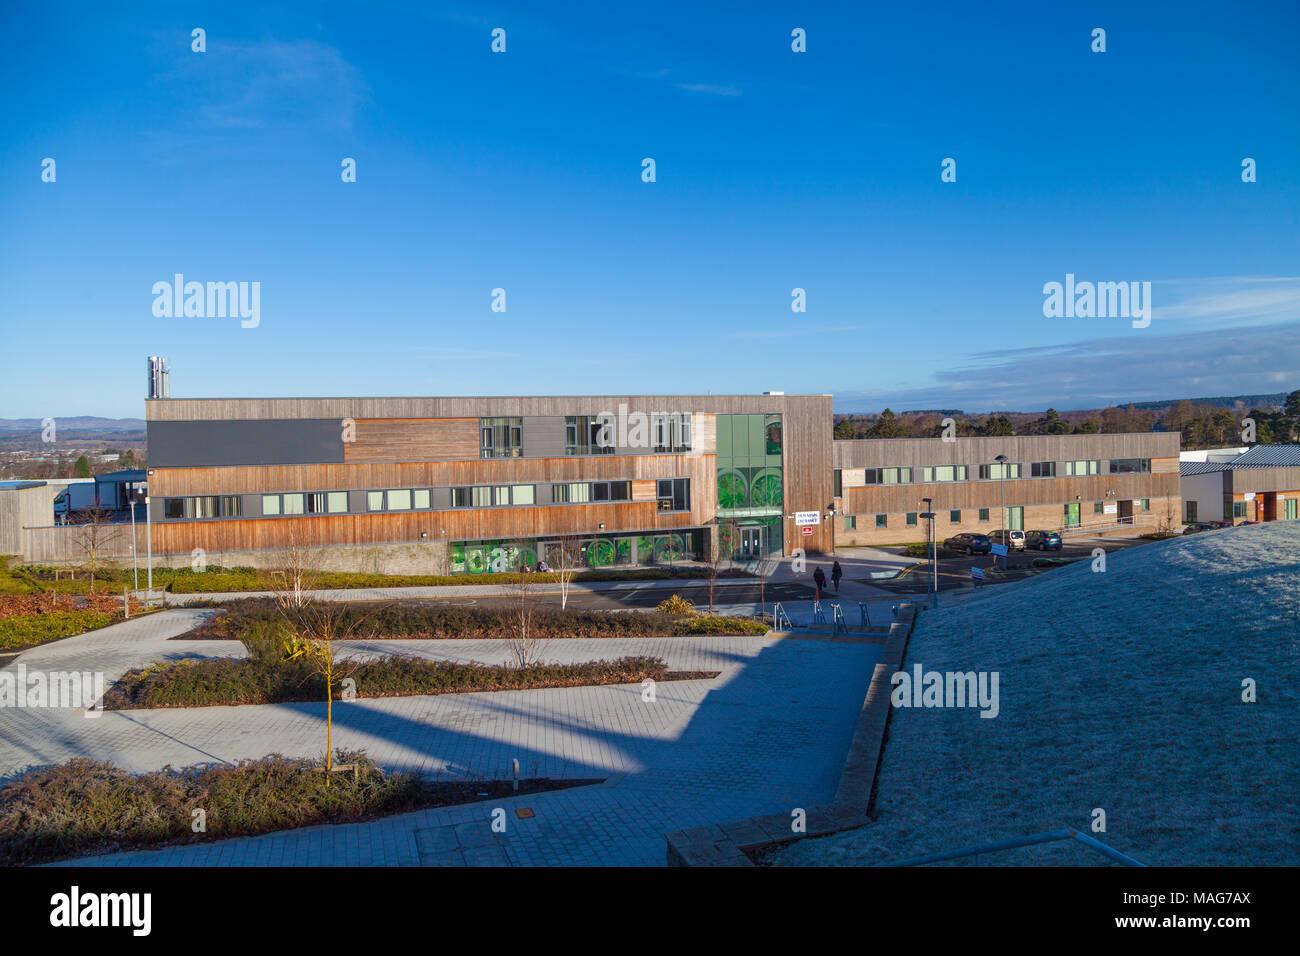 Murray Royal psychiatrischen Krankenhaus, Perth, Schottland. Stockbild